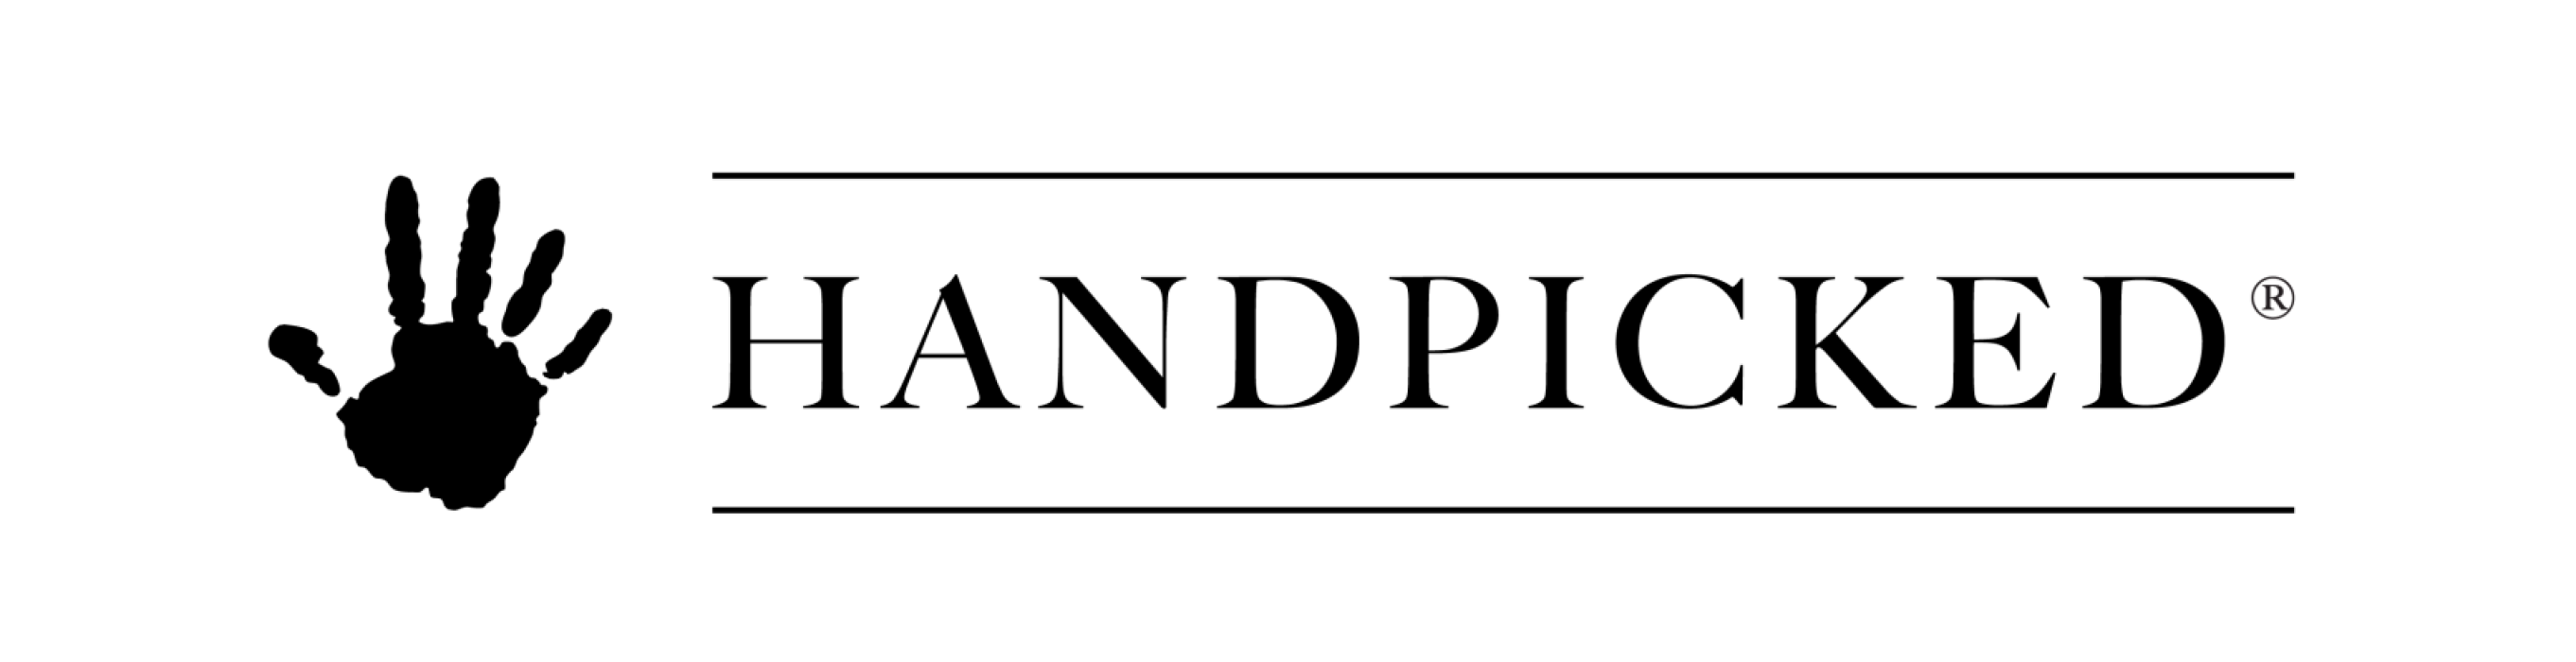 2.-Handpicked-HorizontalLogo-Black.png-01